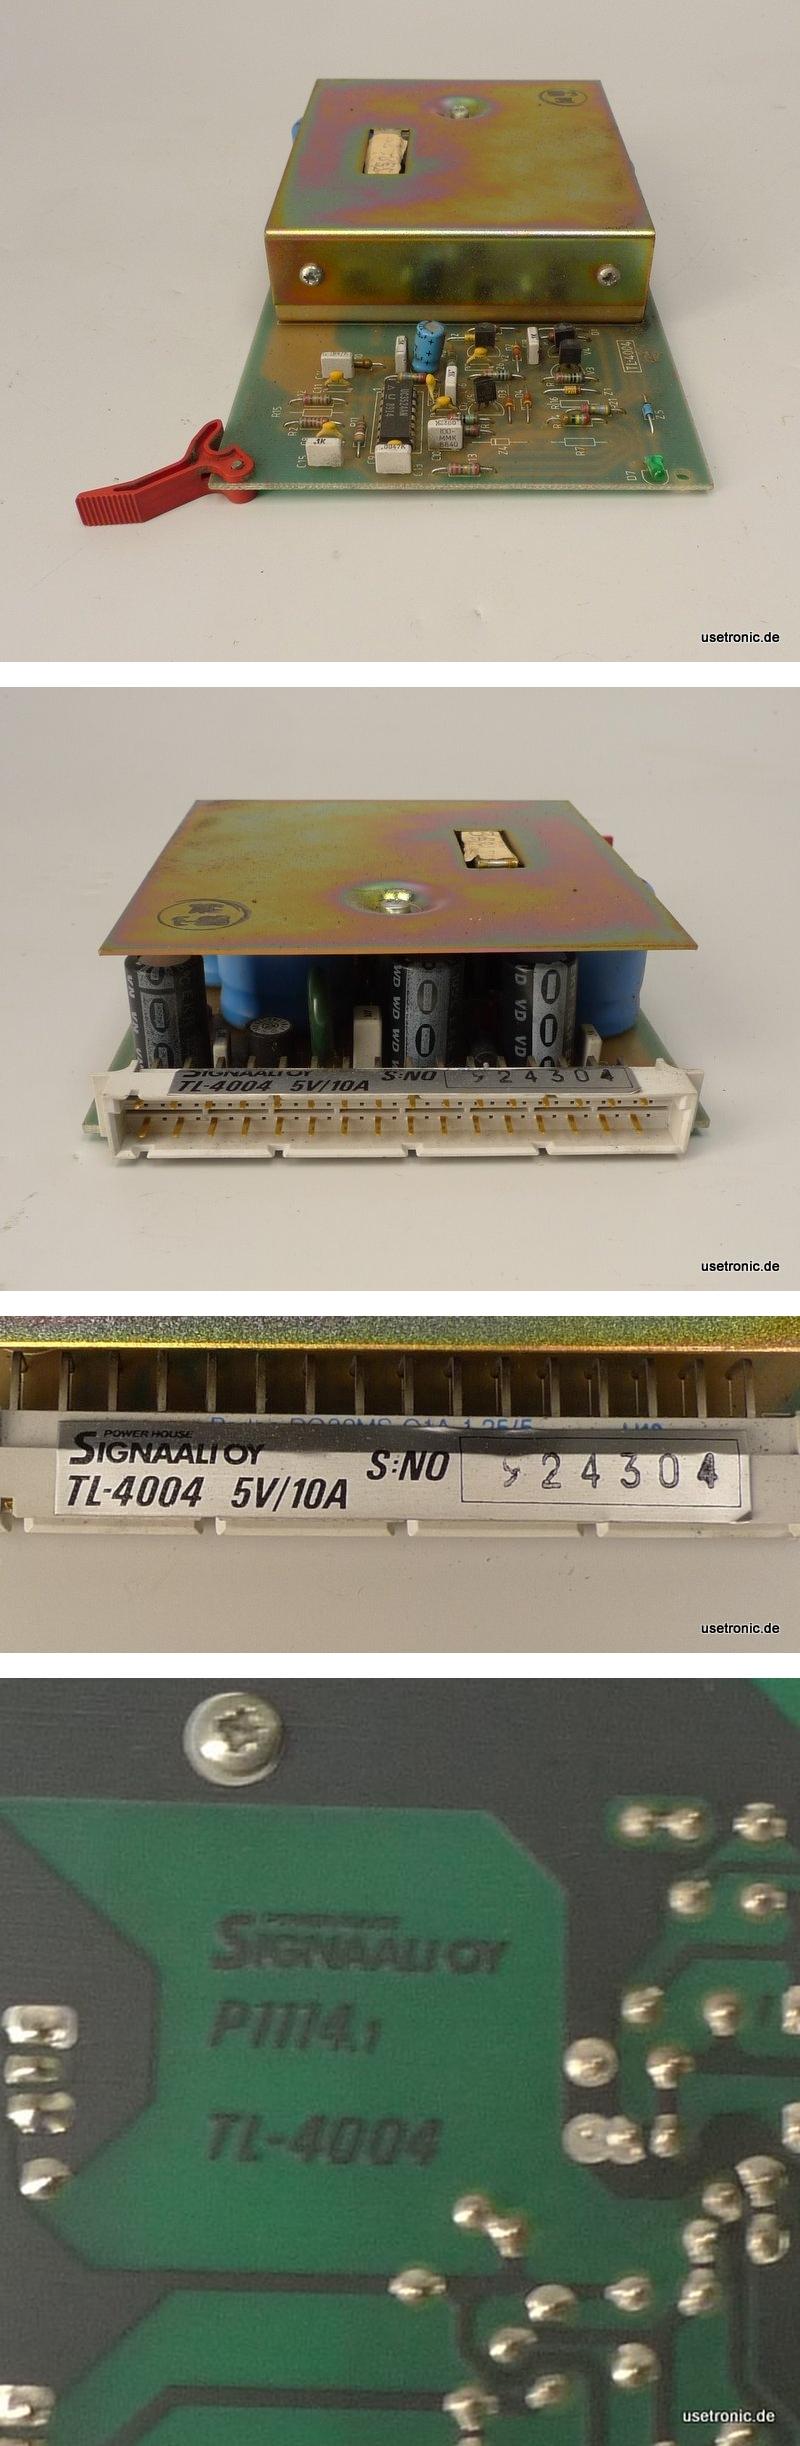 KBA Koenig Bauer Druckmaschine Signaali OY TL-4004 5V 10A